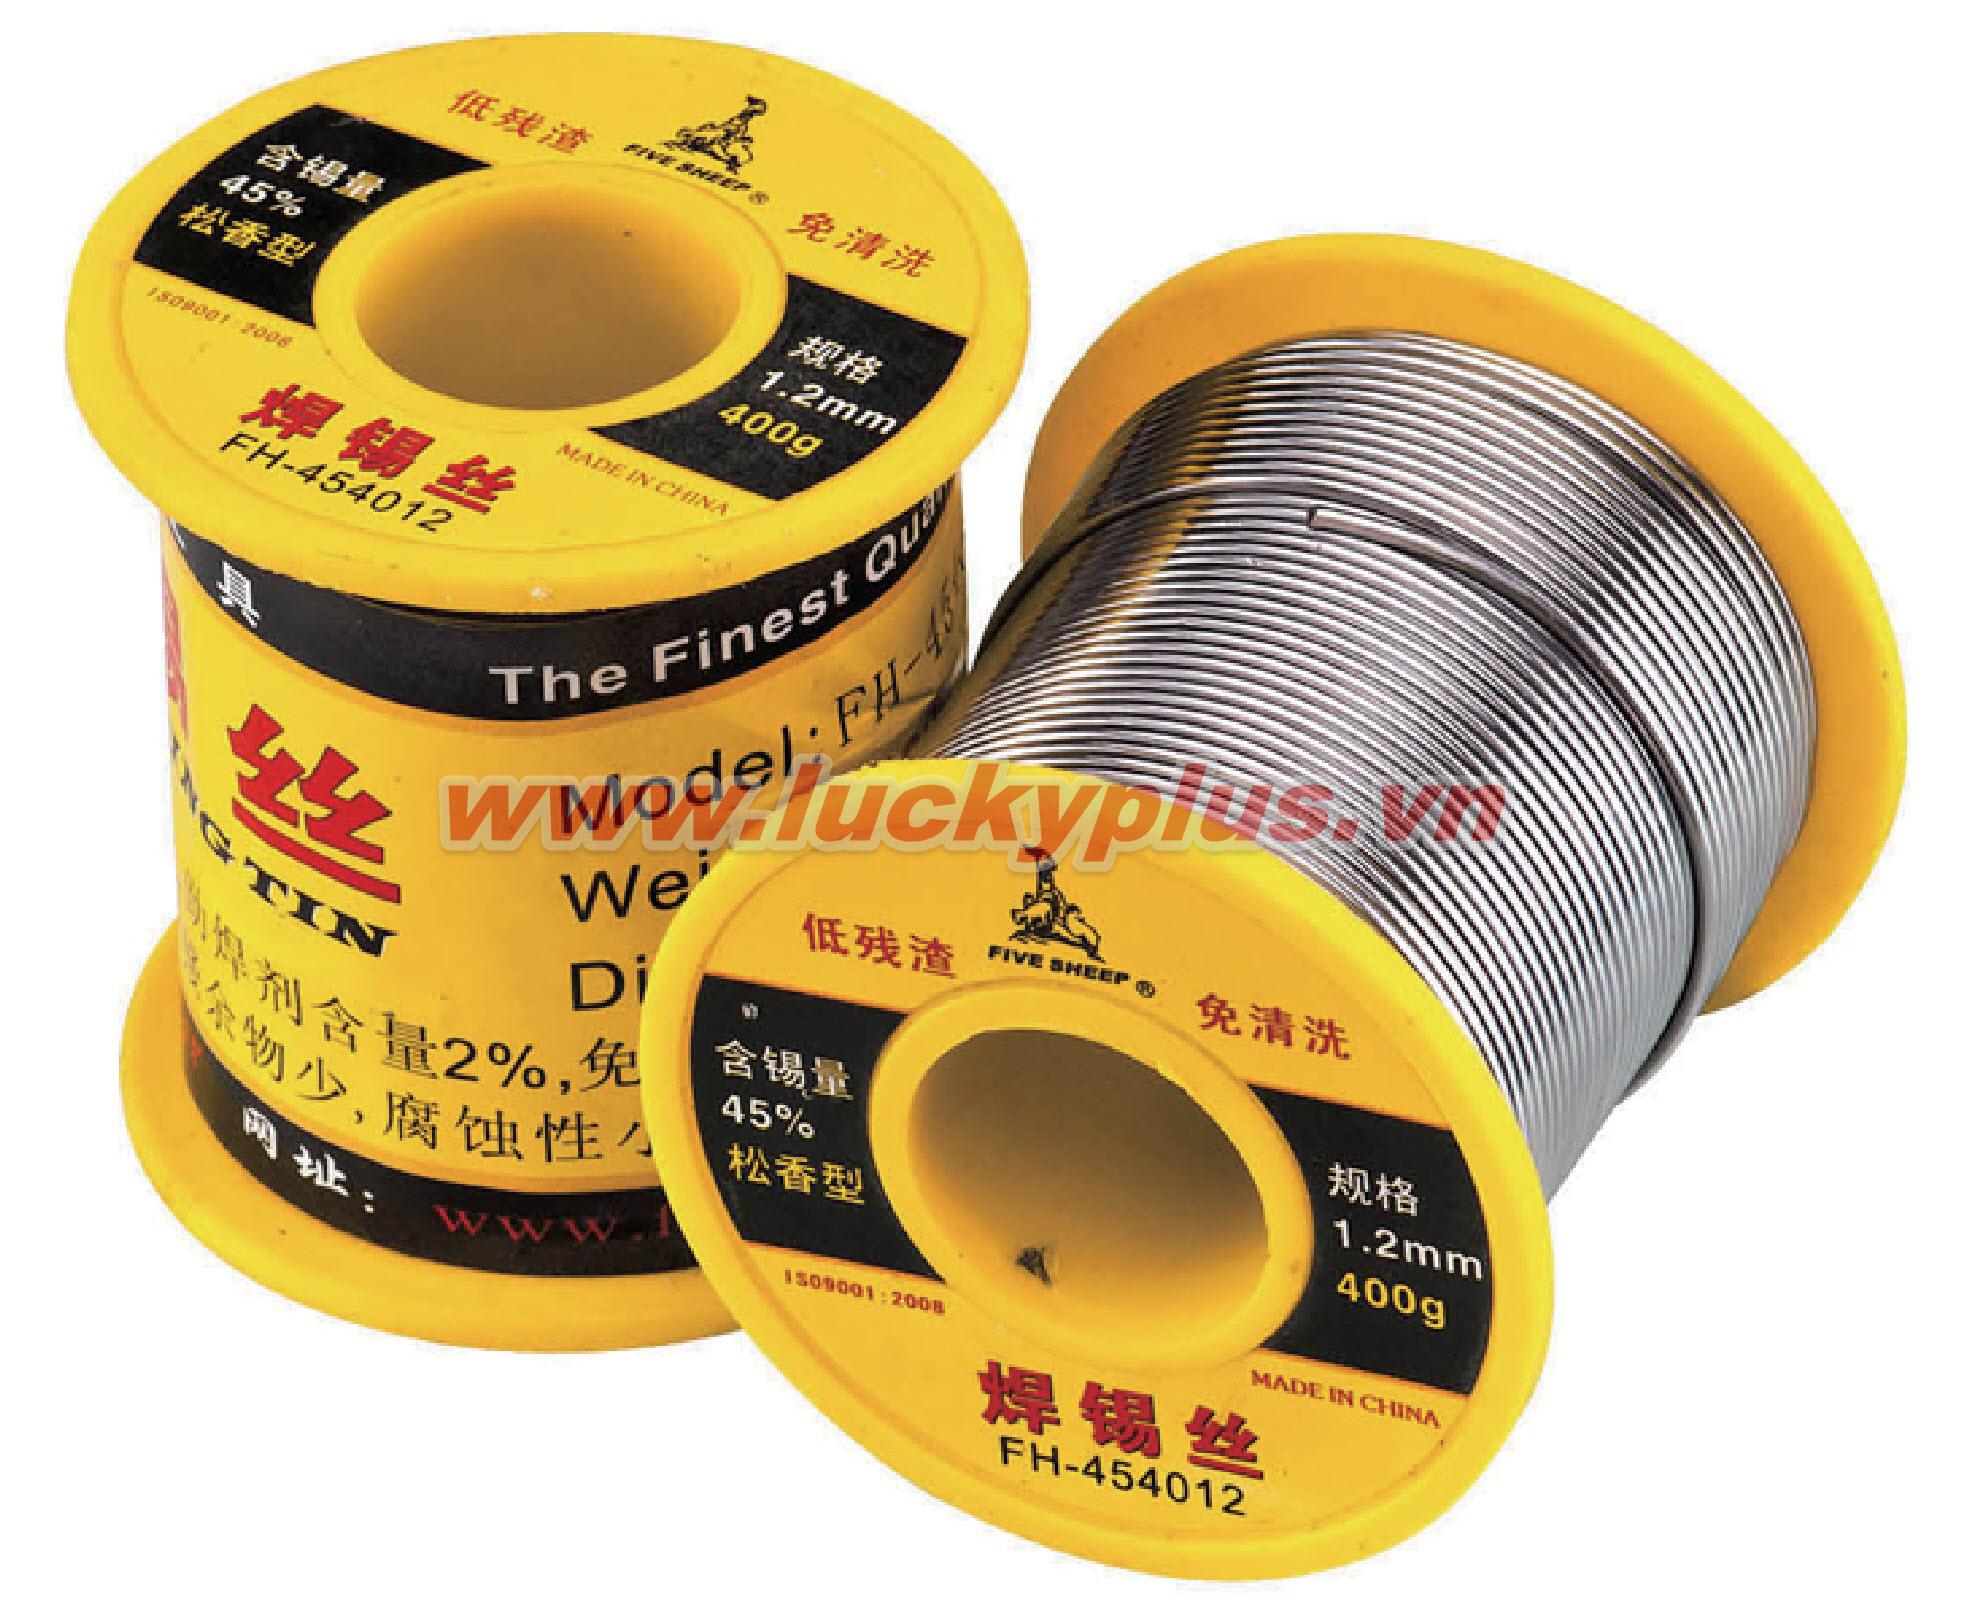 Thiếc hàn FiveSheep FH-45408 400g, FH-45410 400g, FH-45412 400g